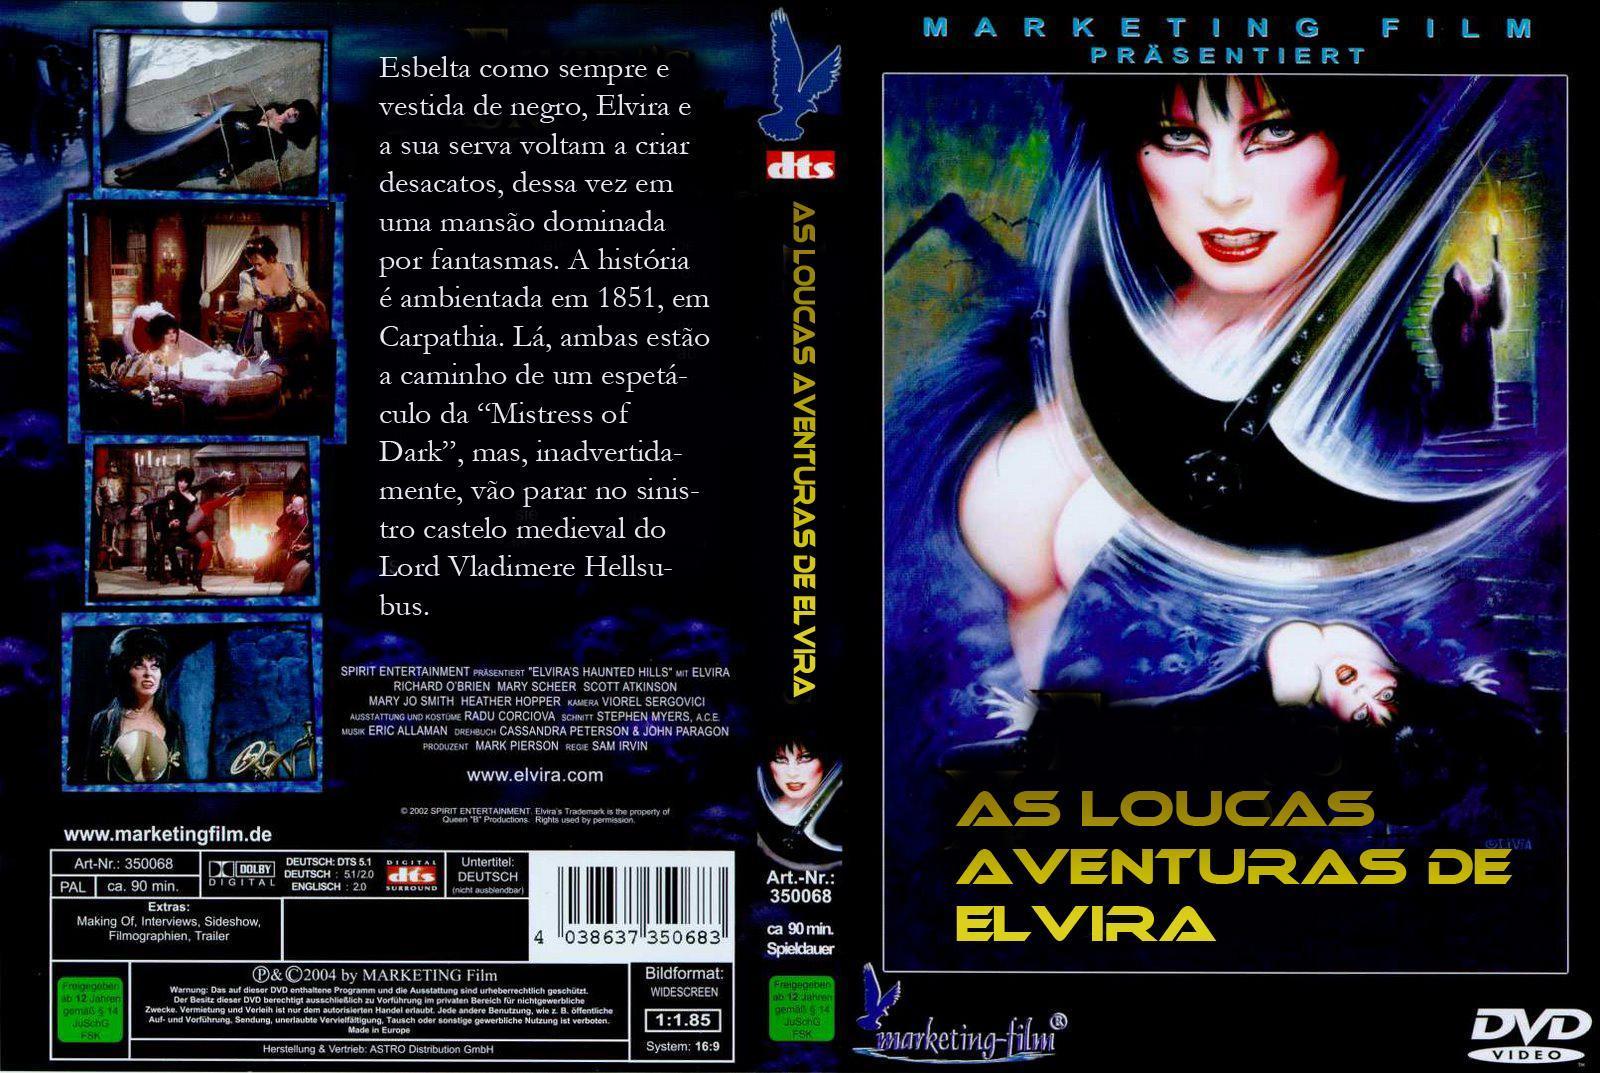 LOUCAS DE BAIXAR FILME ELVIRA AVENTURAS AS